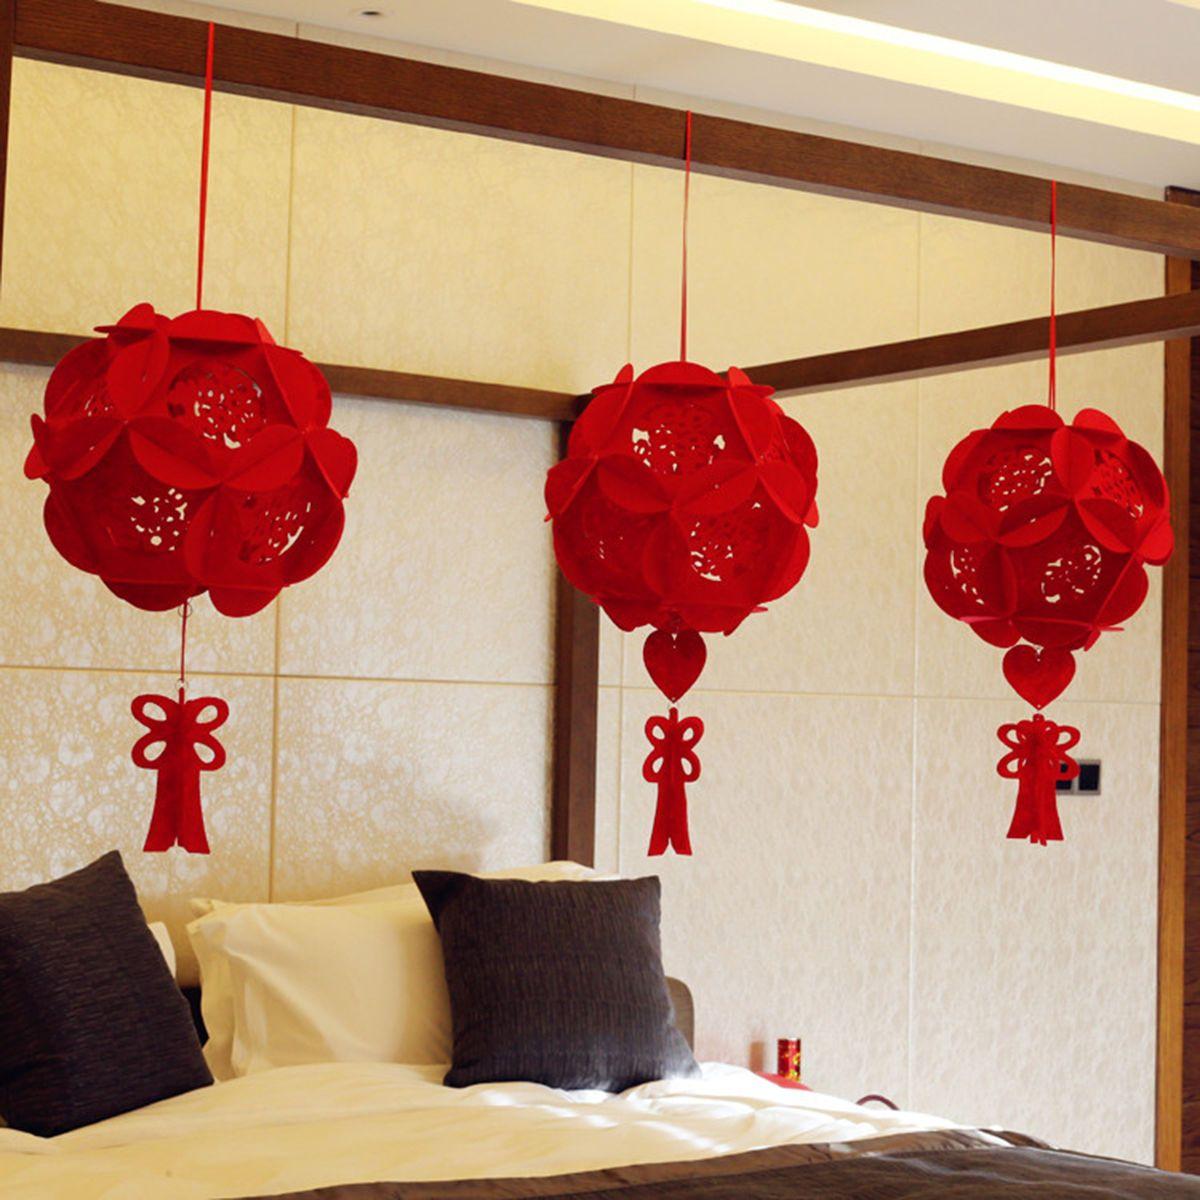 Wedding decorations red  pc Chinese wedding supplies Wedding decoration Red Lantern 浪漫婚房